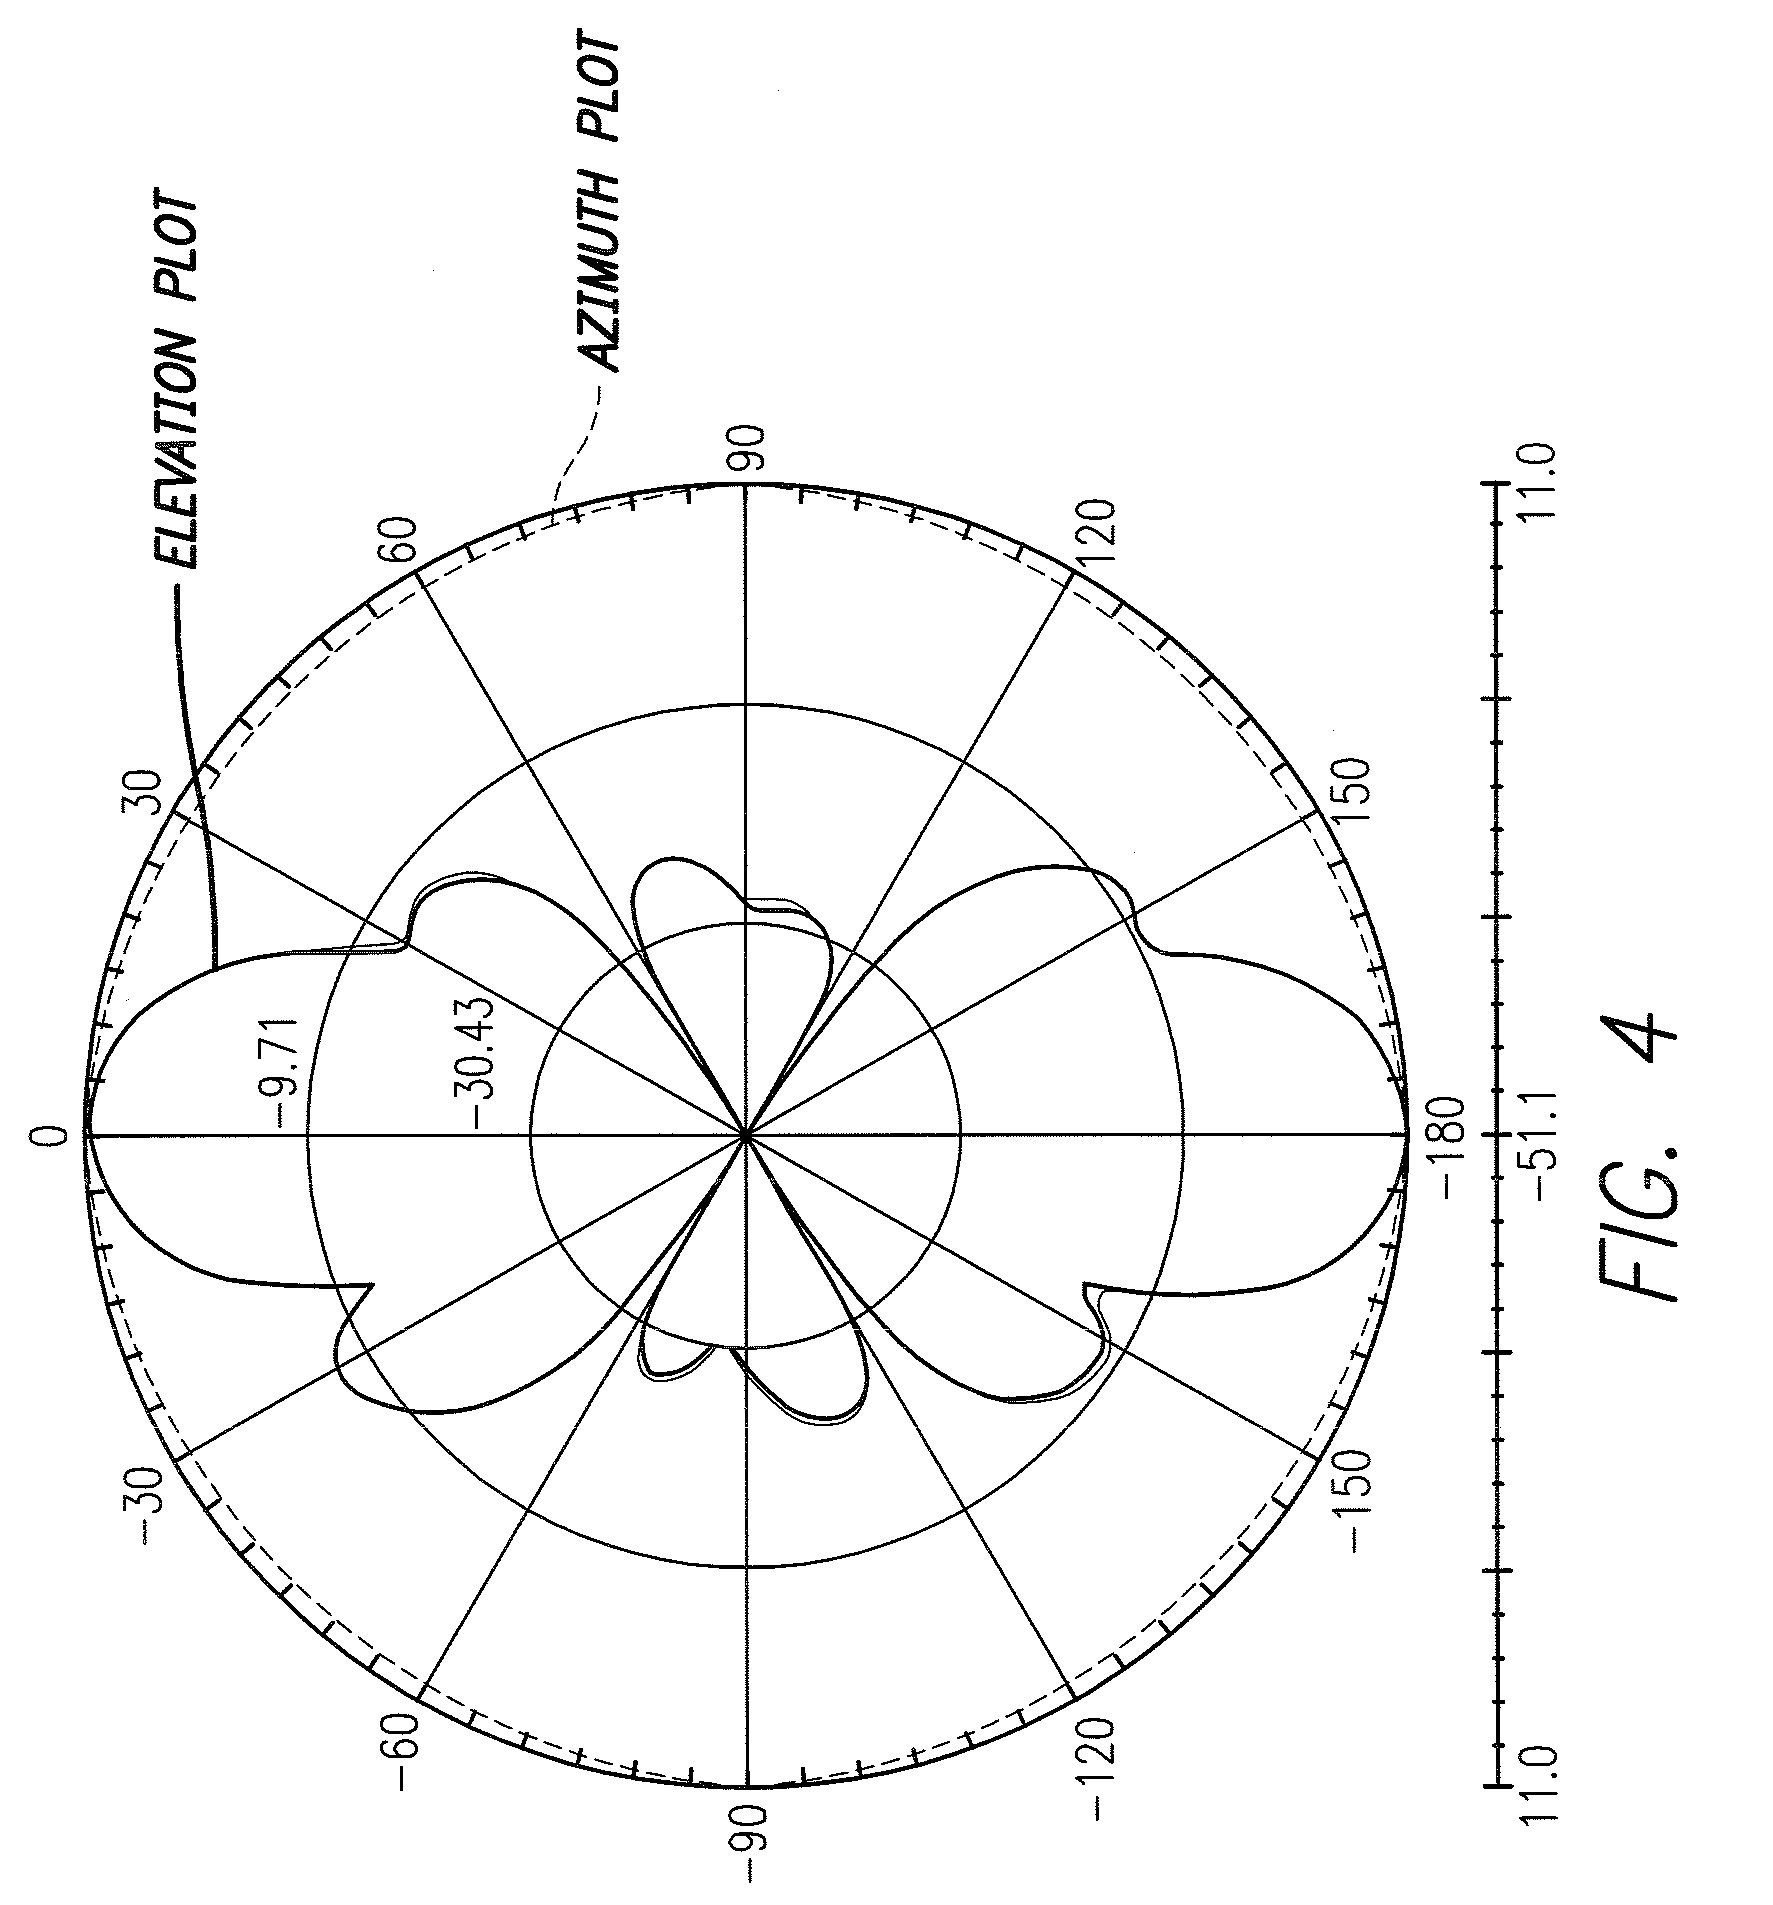 mobliquatm bandwidth enhancing antenna